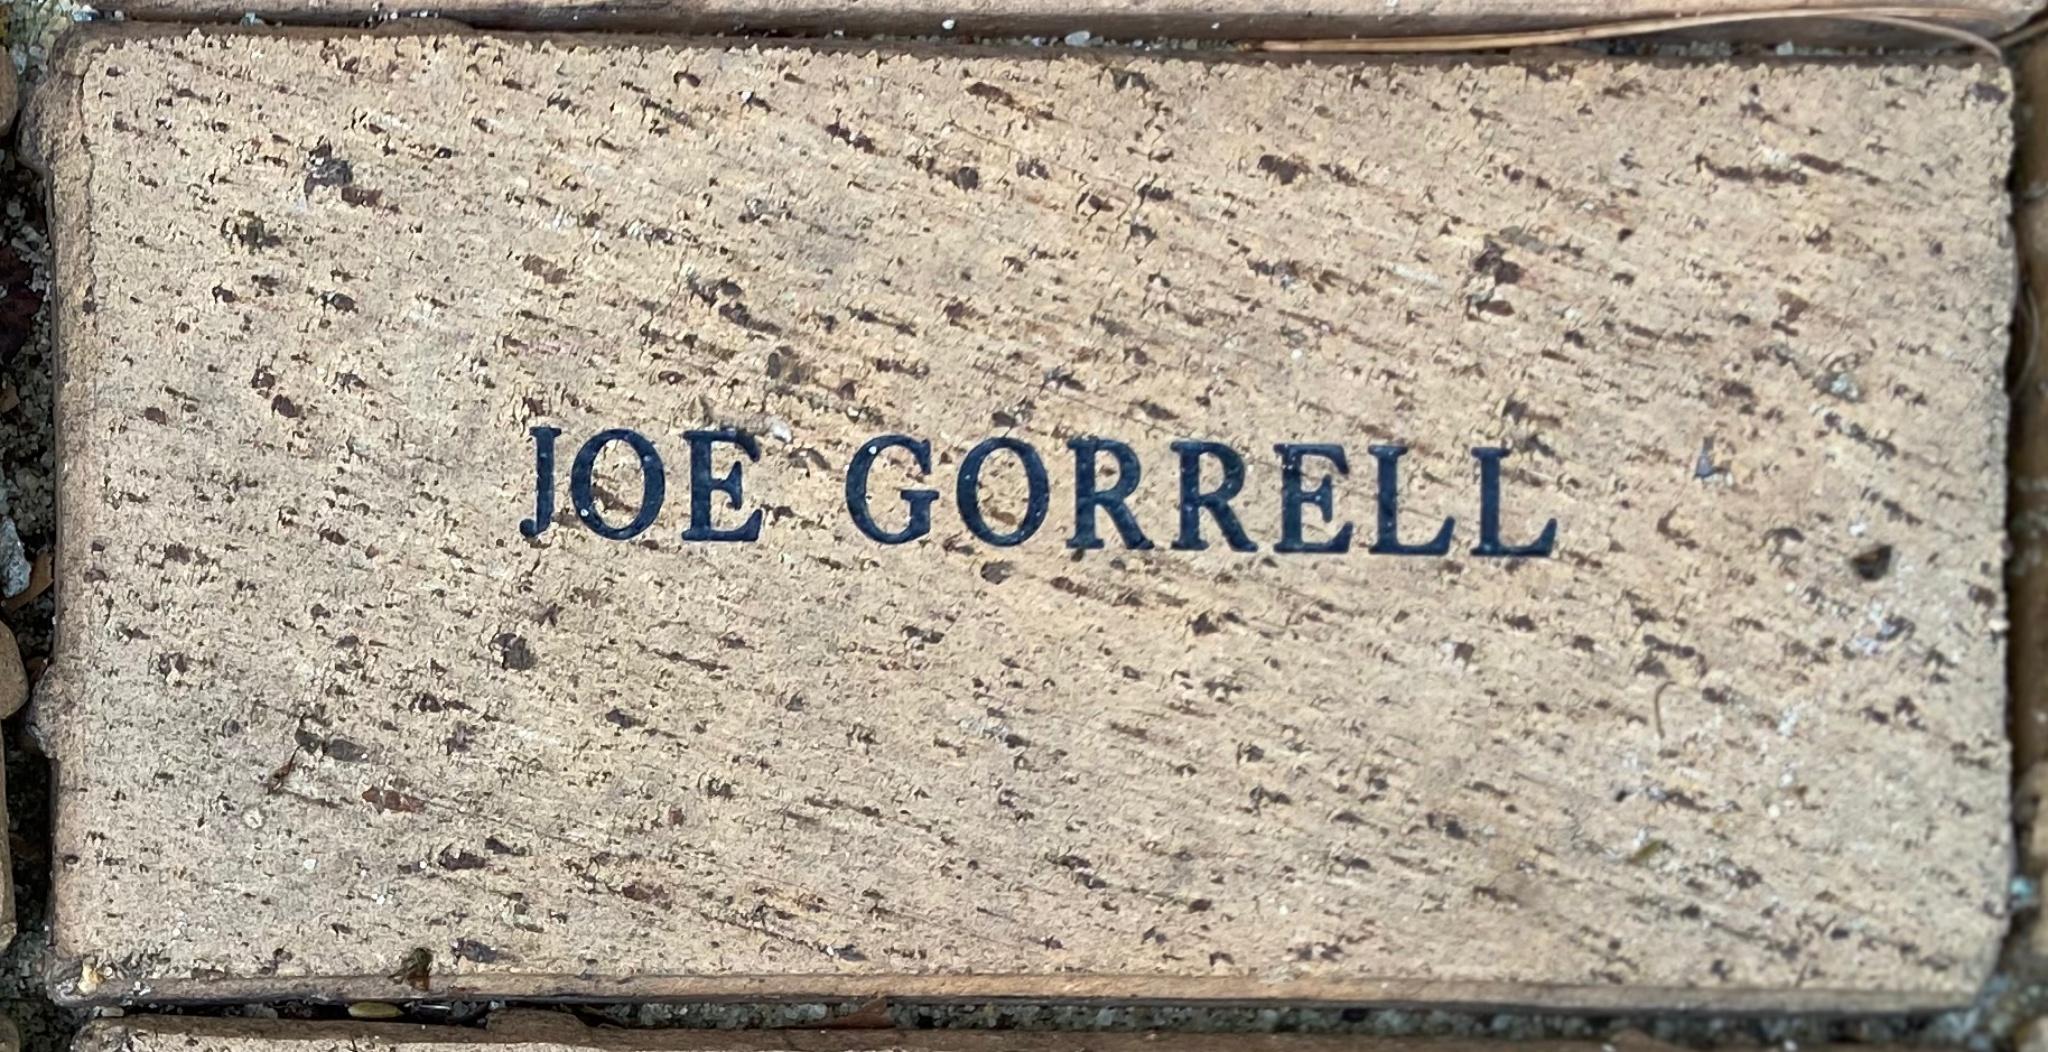 JOE GORRELL